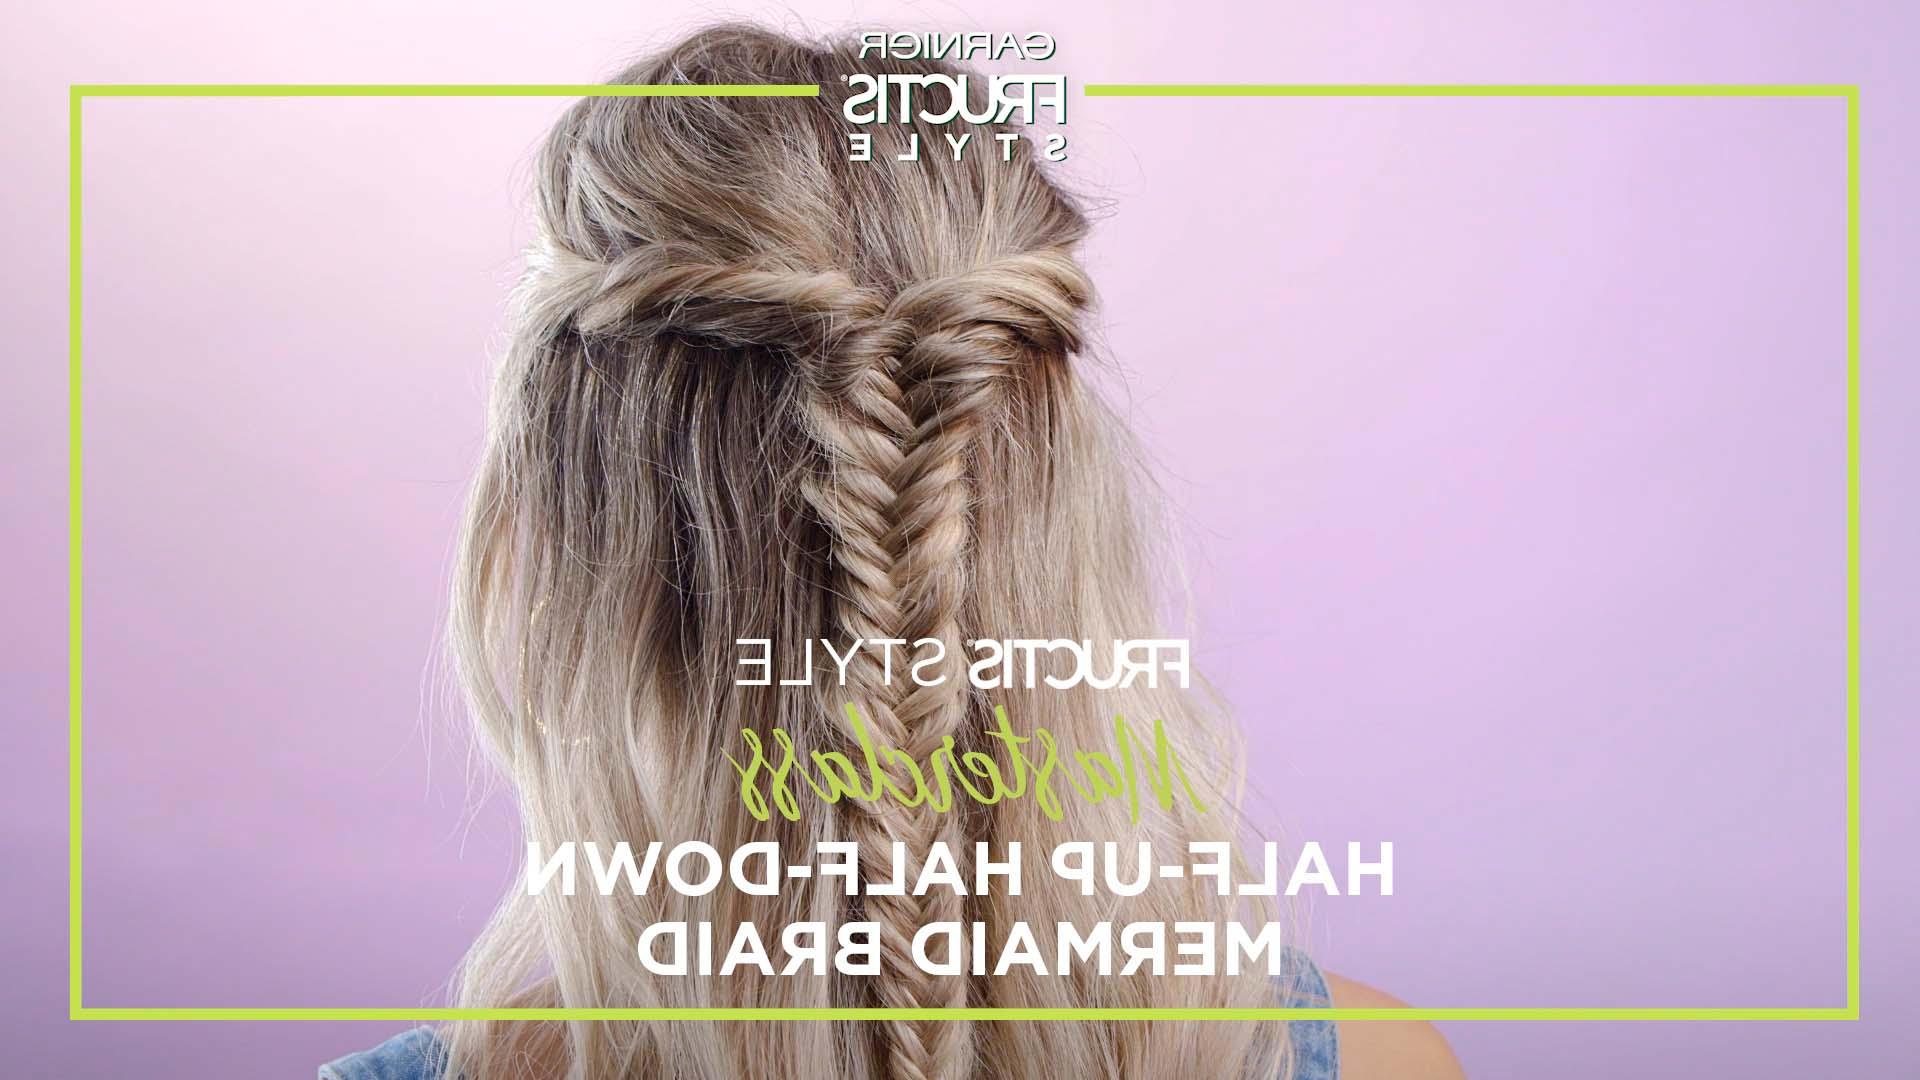 Best And Newest Half Up Half Down Boho Braided Hairstyles With Half Up Half Down Mermaid Braid Hairstyle – Hair Tutorial & Tips (View 19 of 20)